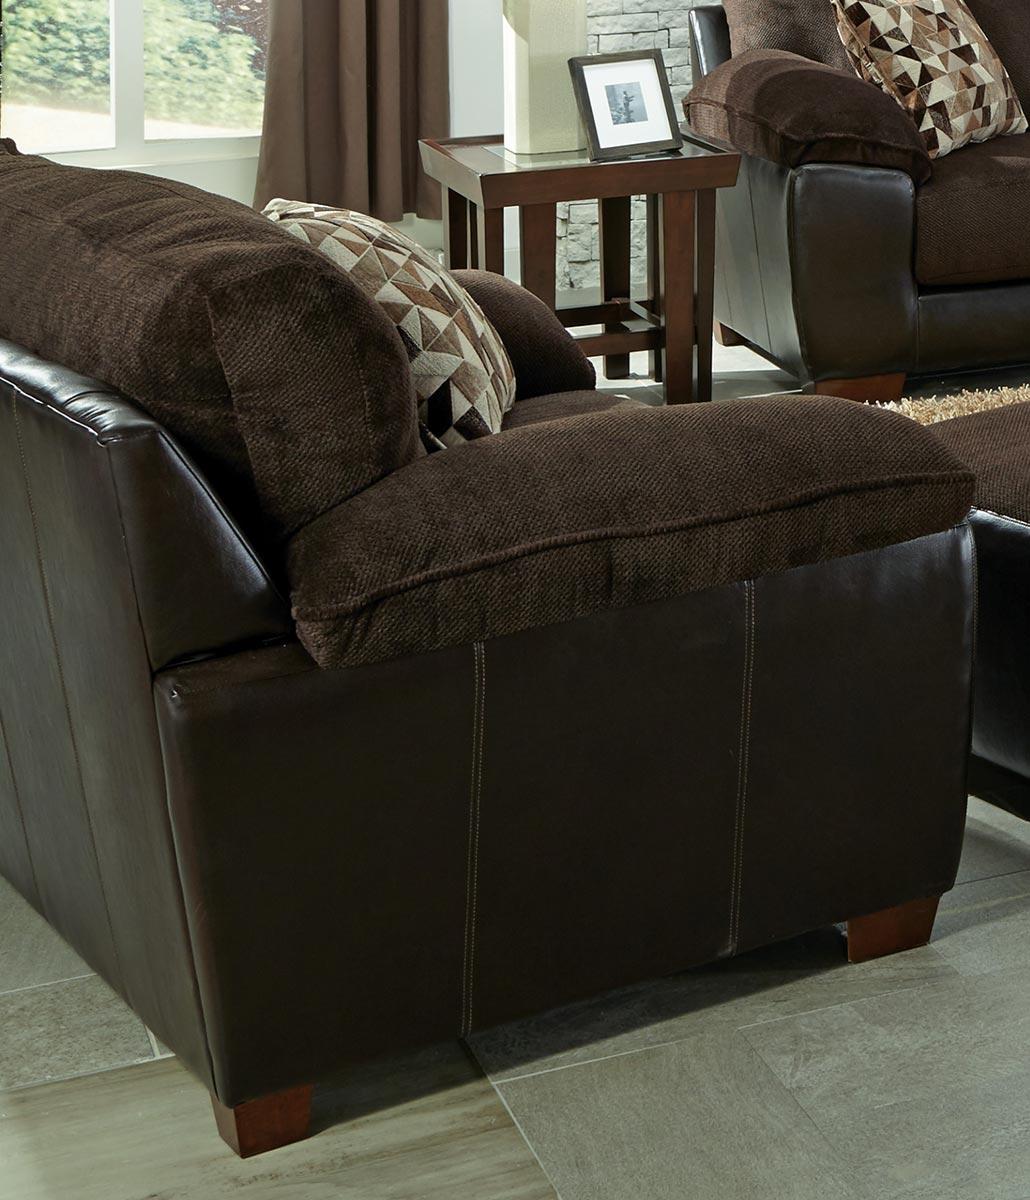 Jackson Pinson Chair and Half - Chocolate